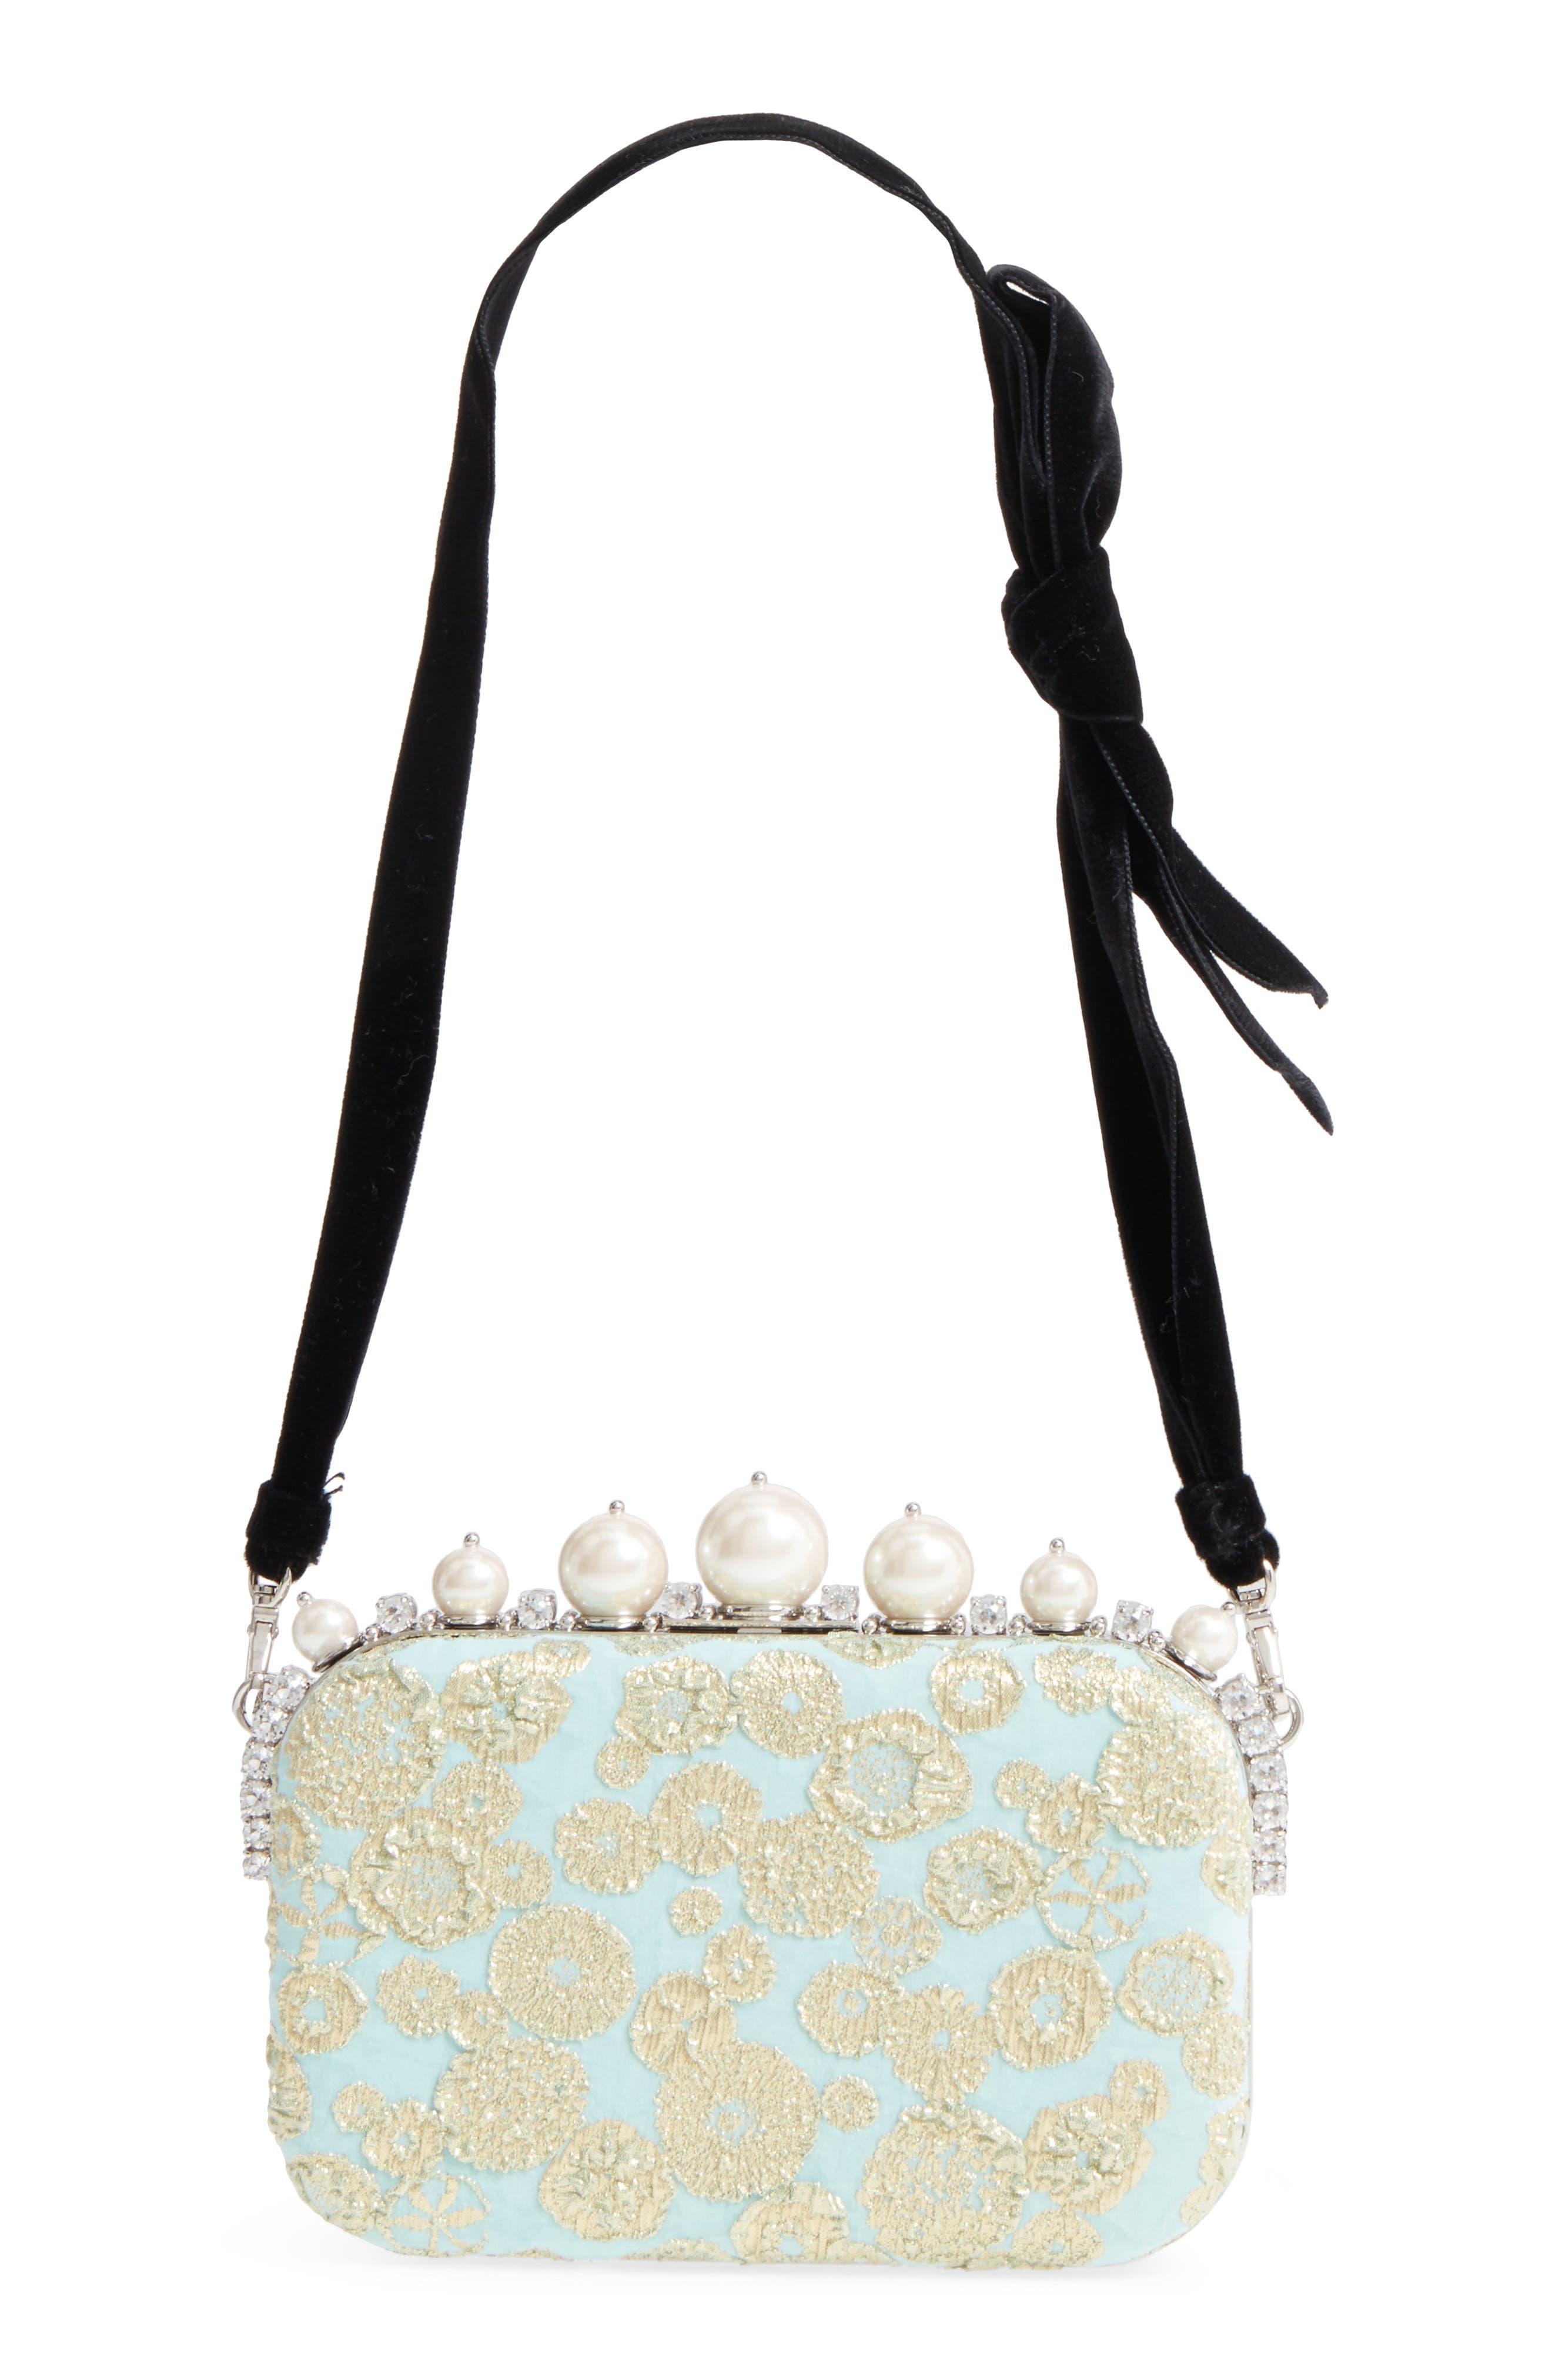 Main Image - Miu Miu Imitation Pearl & Metallic Brocade Shoulder Bag